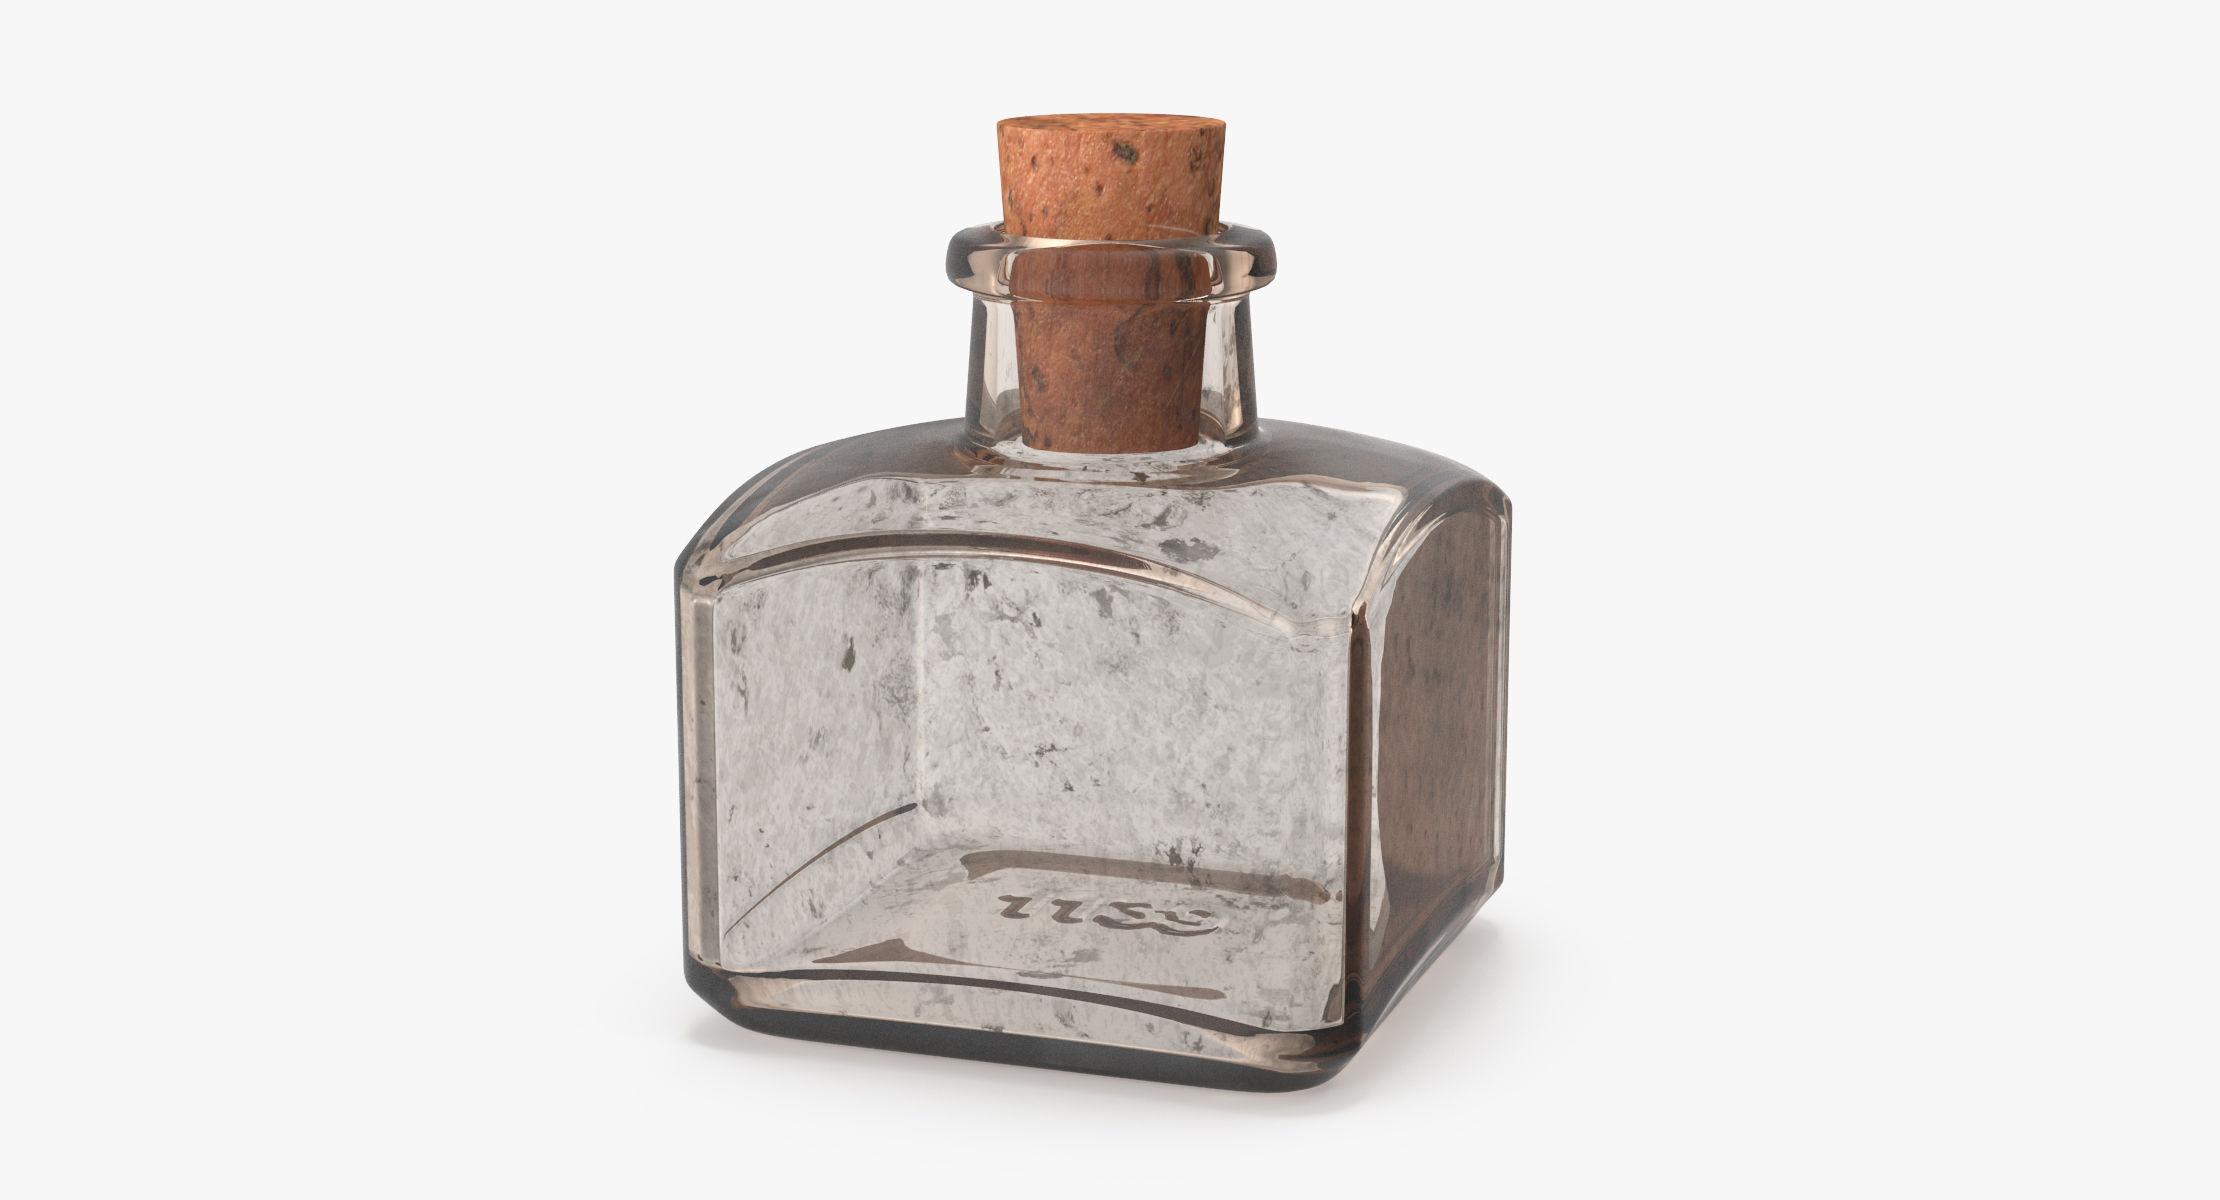 Old Glass Bottle 04 - reel 1